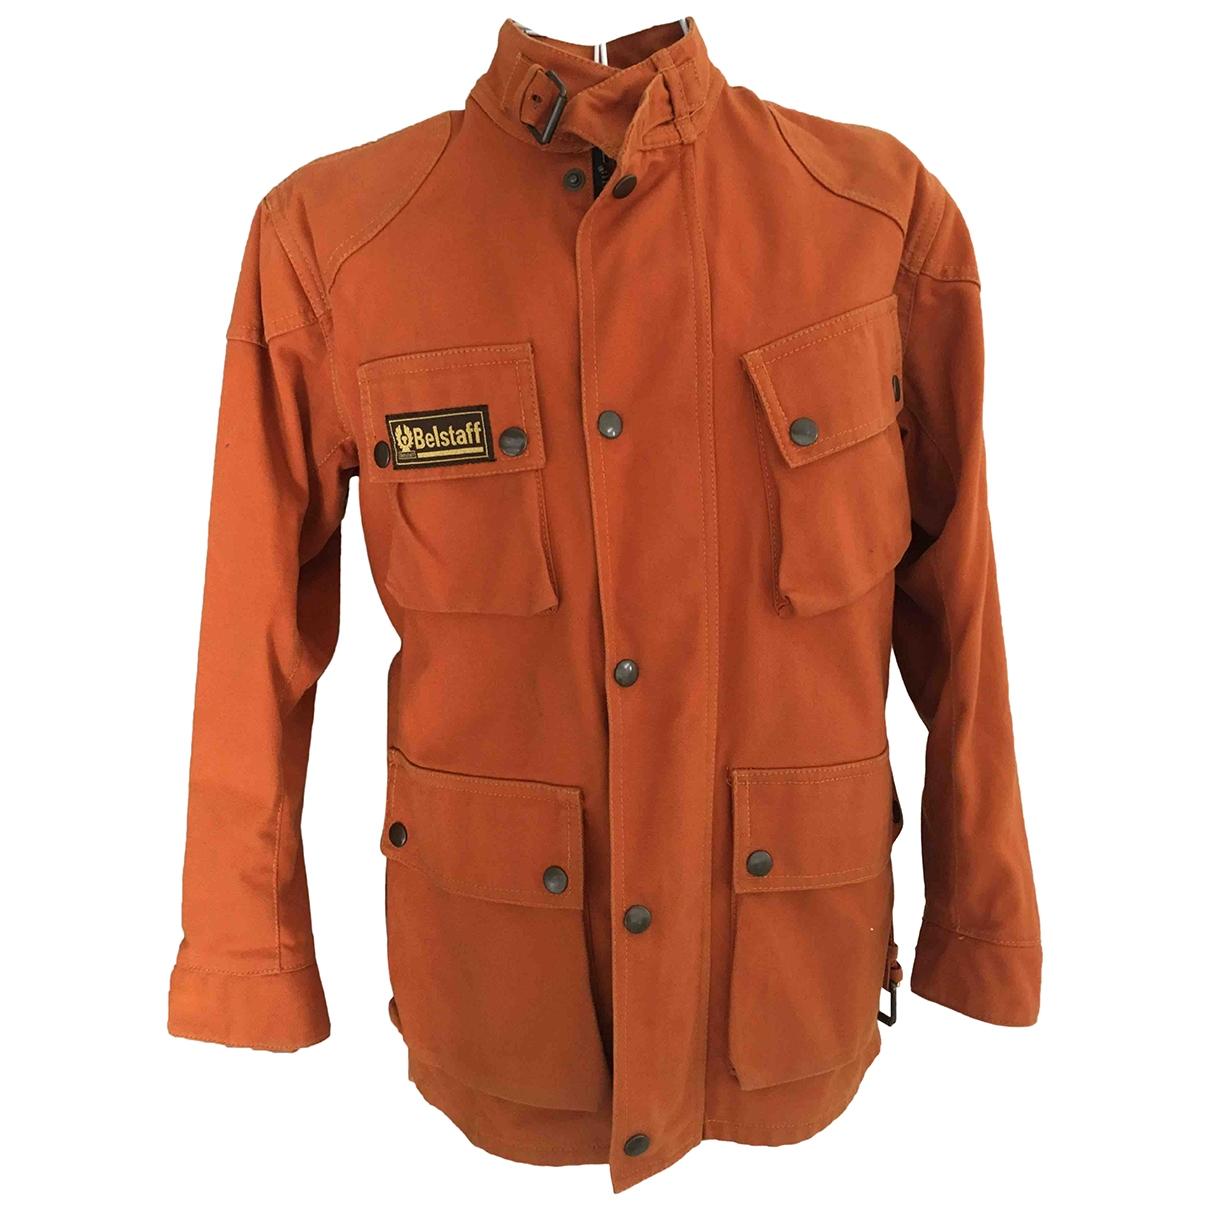 Belstaff \N Orange Cotton jacket & coat for Kids 10 years - up to 142cm FR